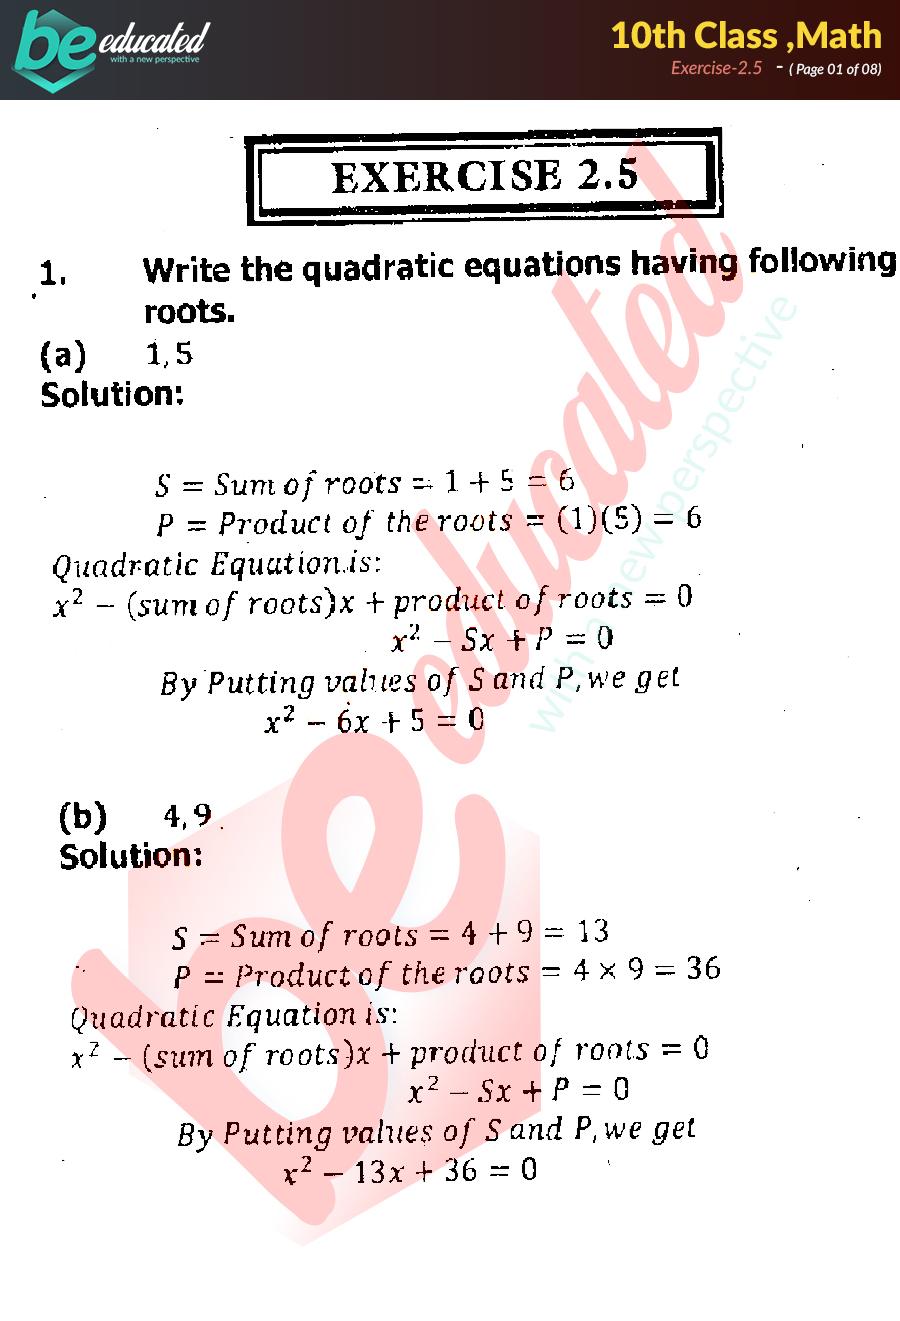 Sindh Textbook Board Jamshoro Mathematics Xi Solutions Pdf